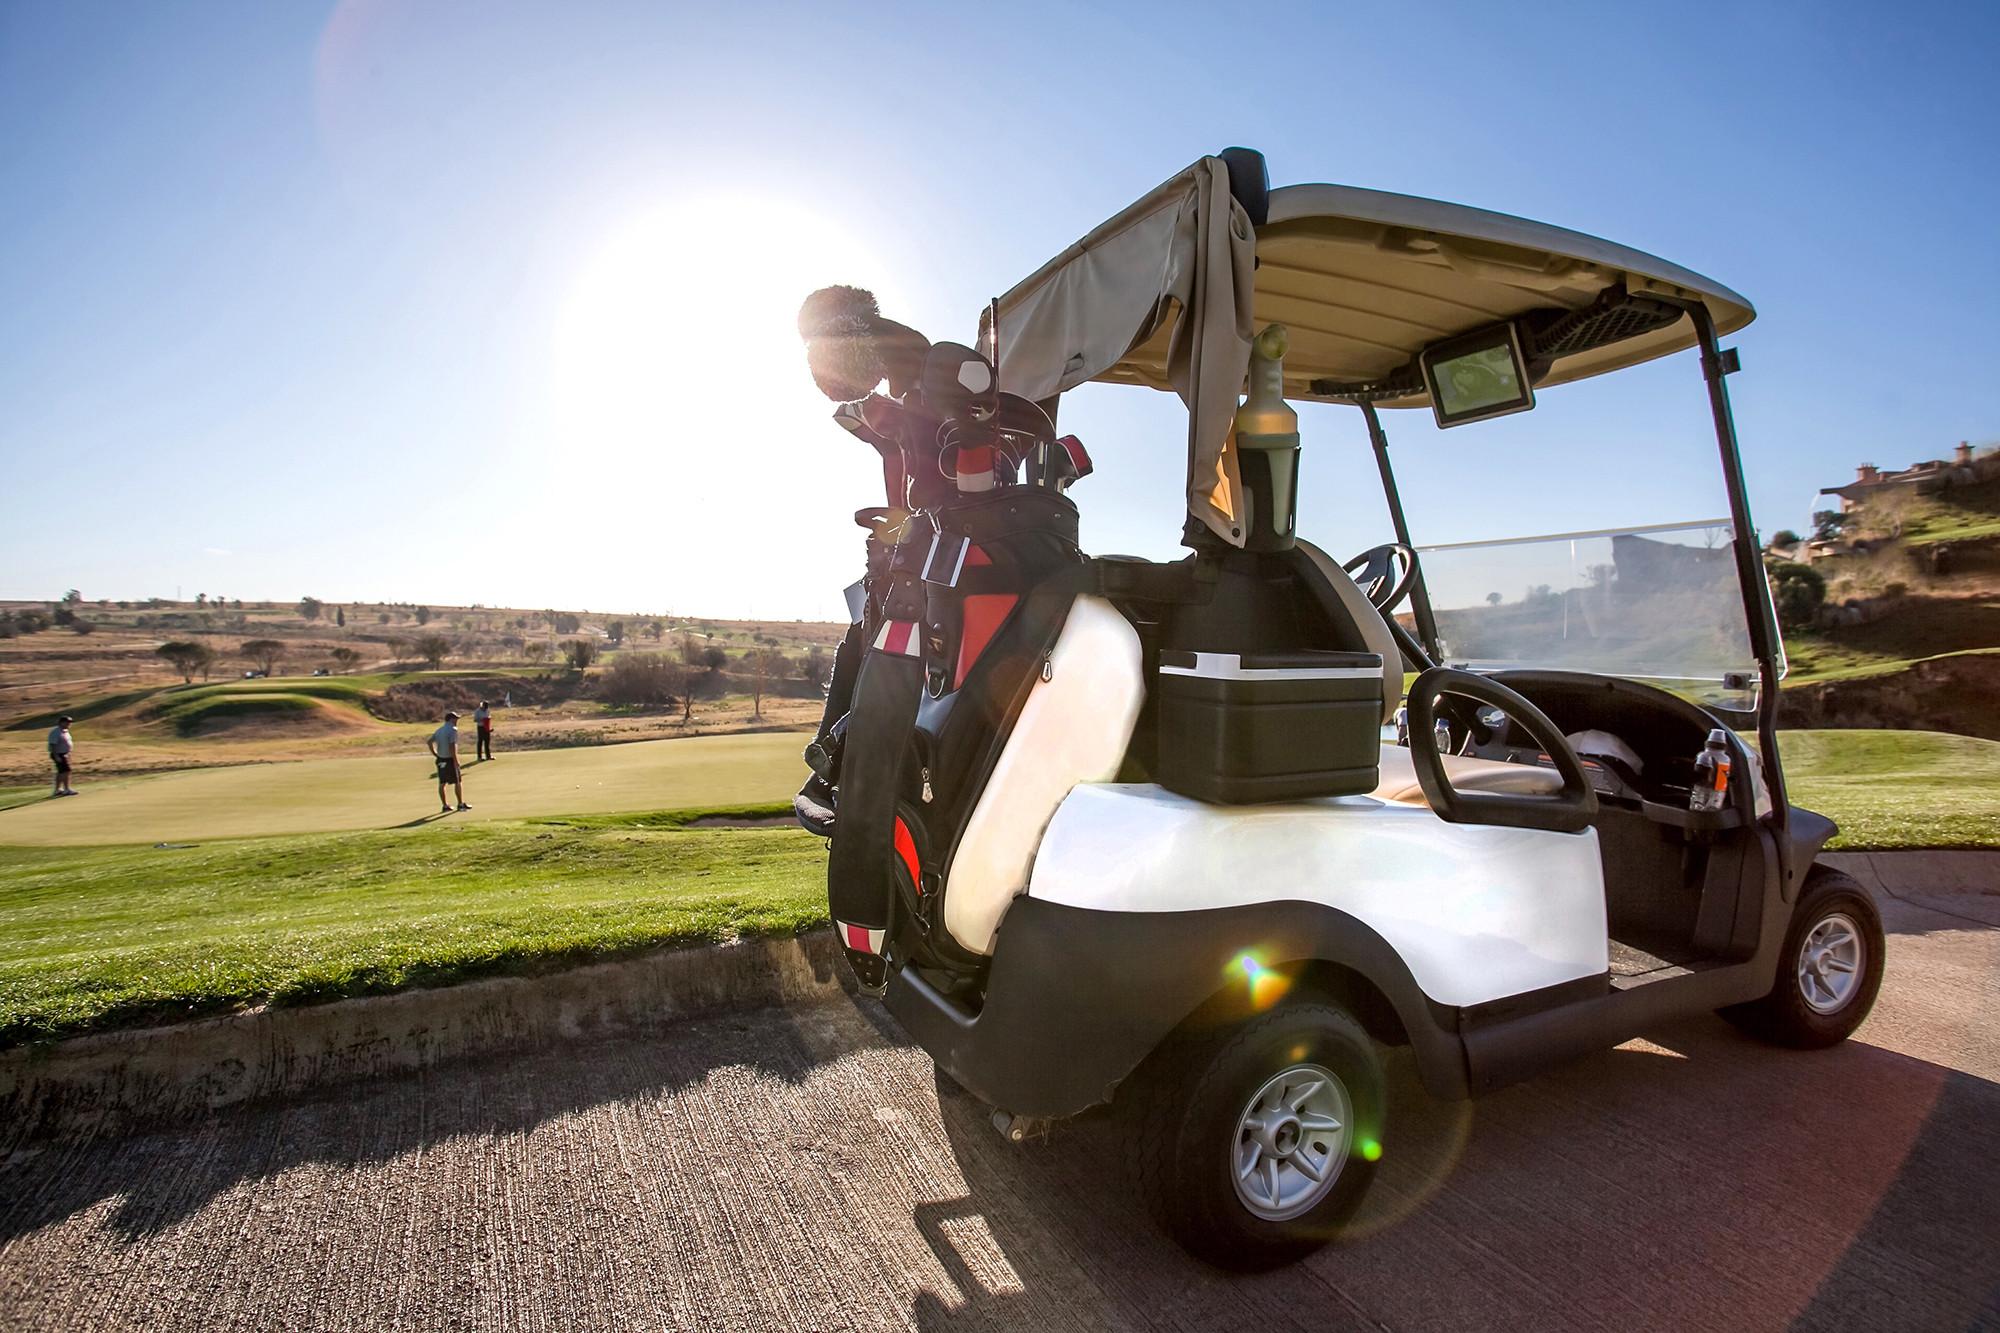 club-car-dart-swinger--angle--golf-cart--golf-course--rear.jpg